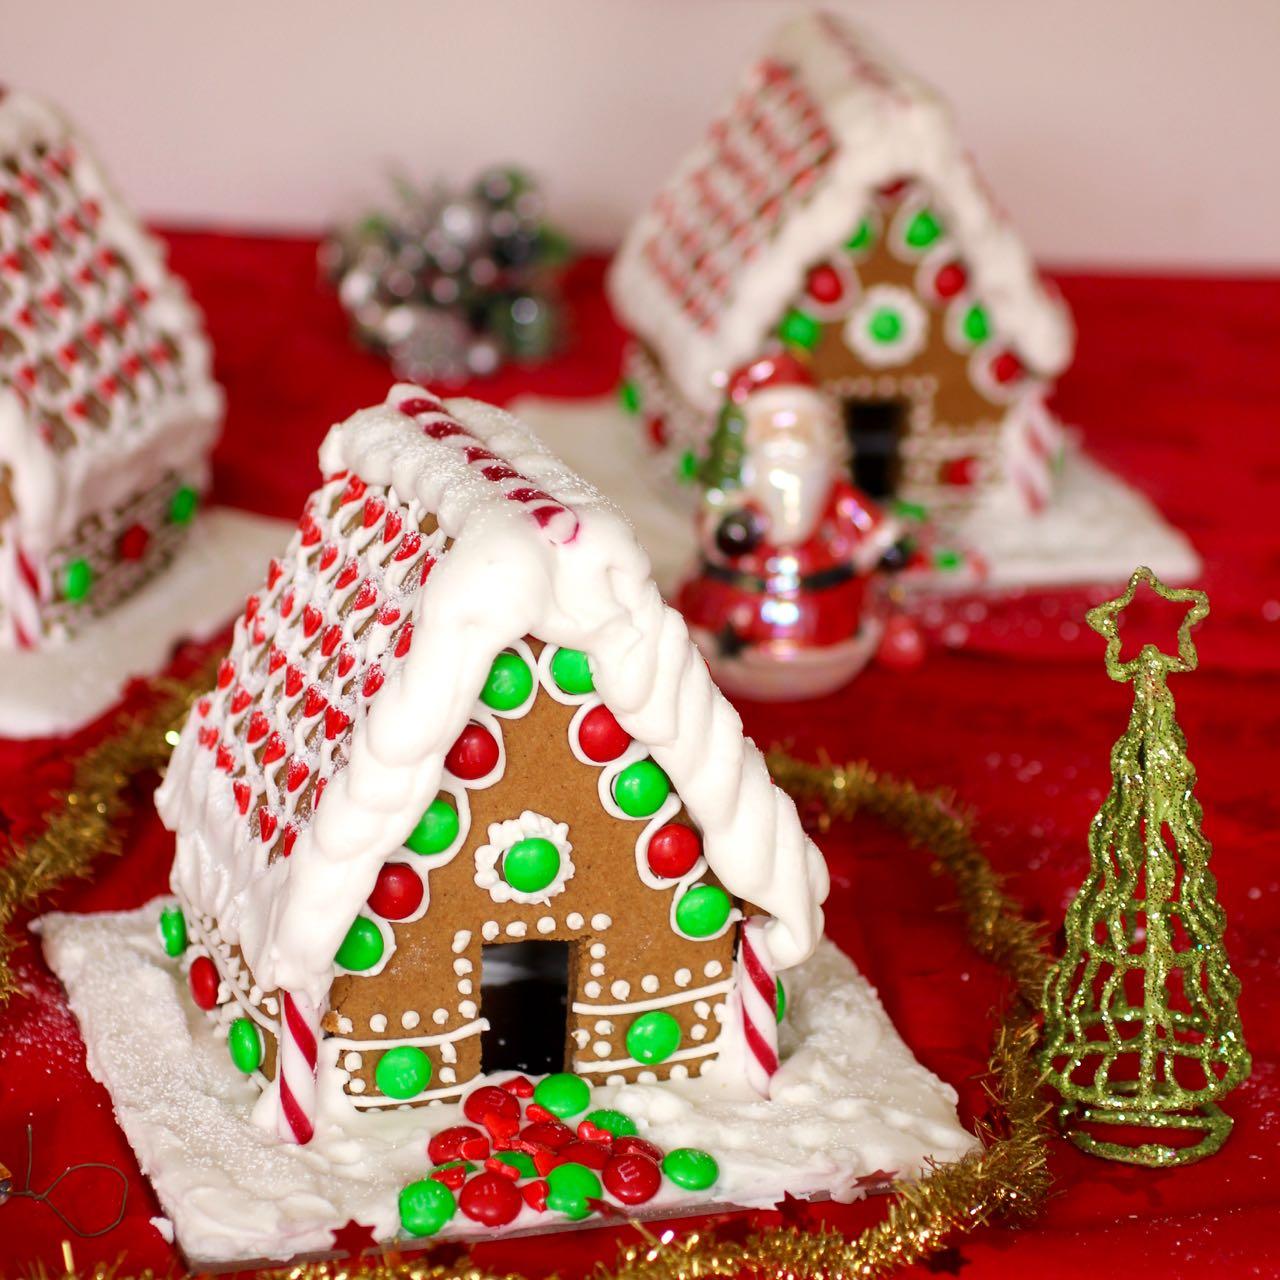 Green Gourmet Giraffe Small Gingerbread Houses With Vegan Royal